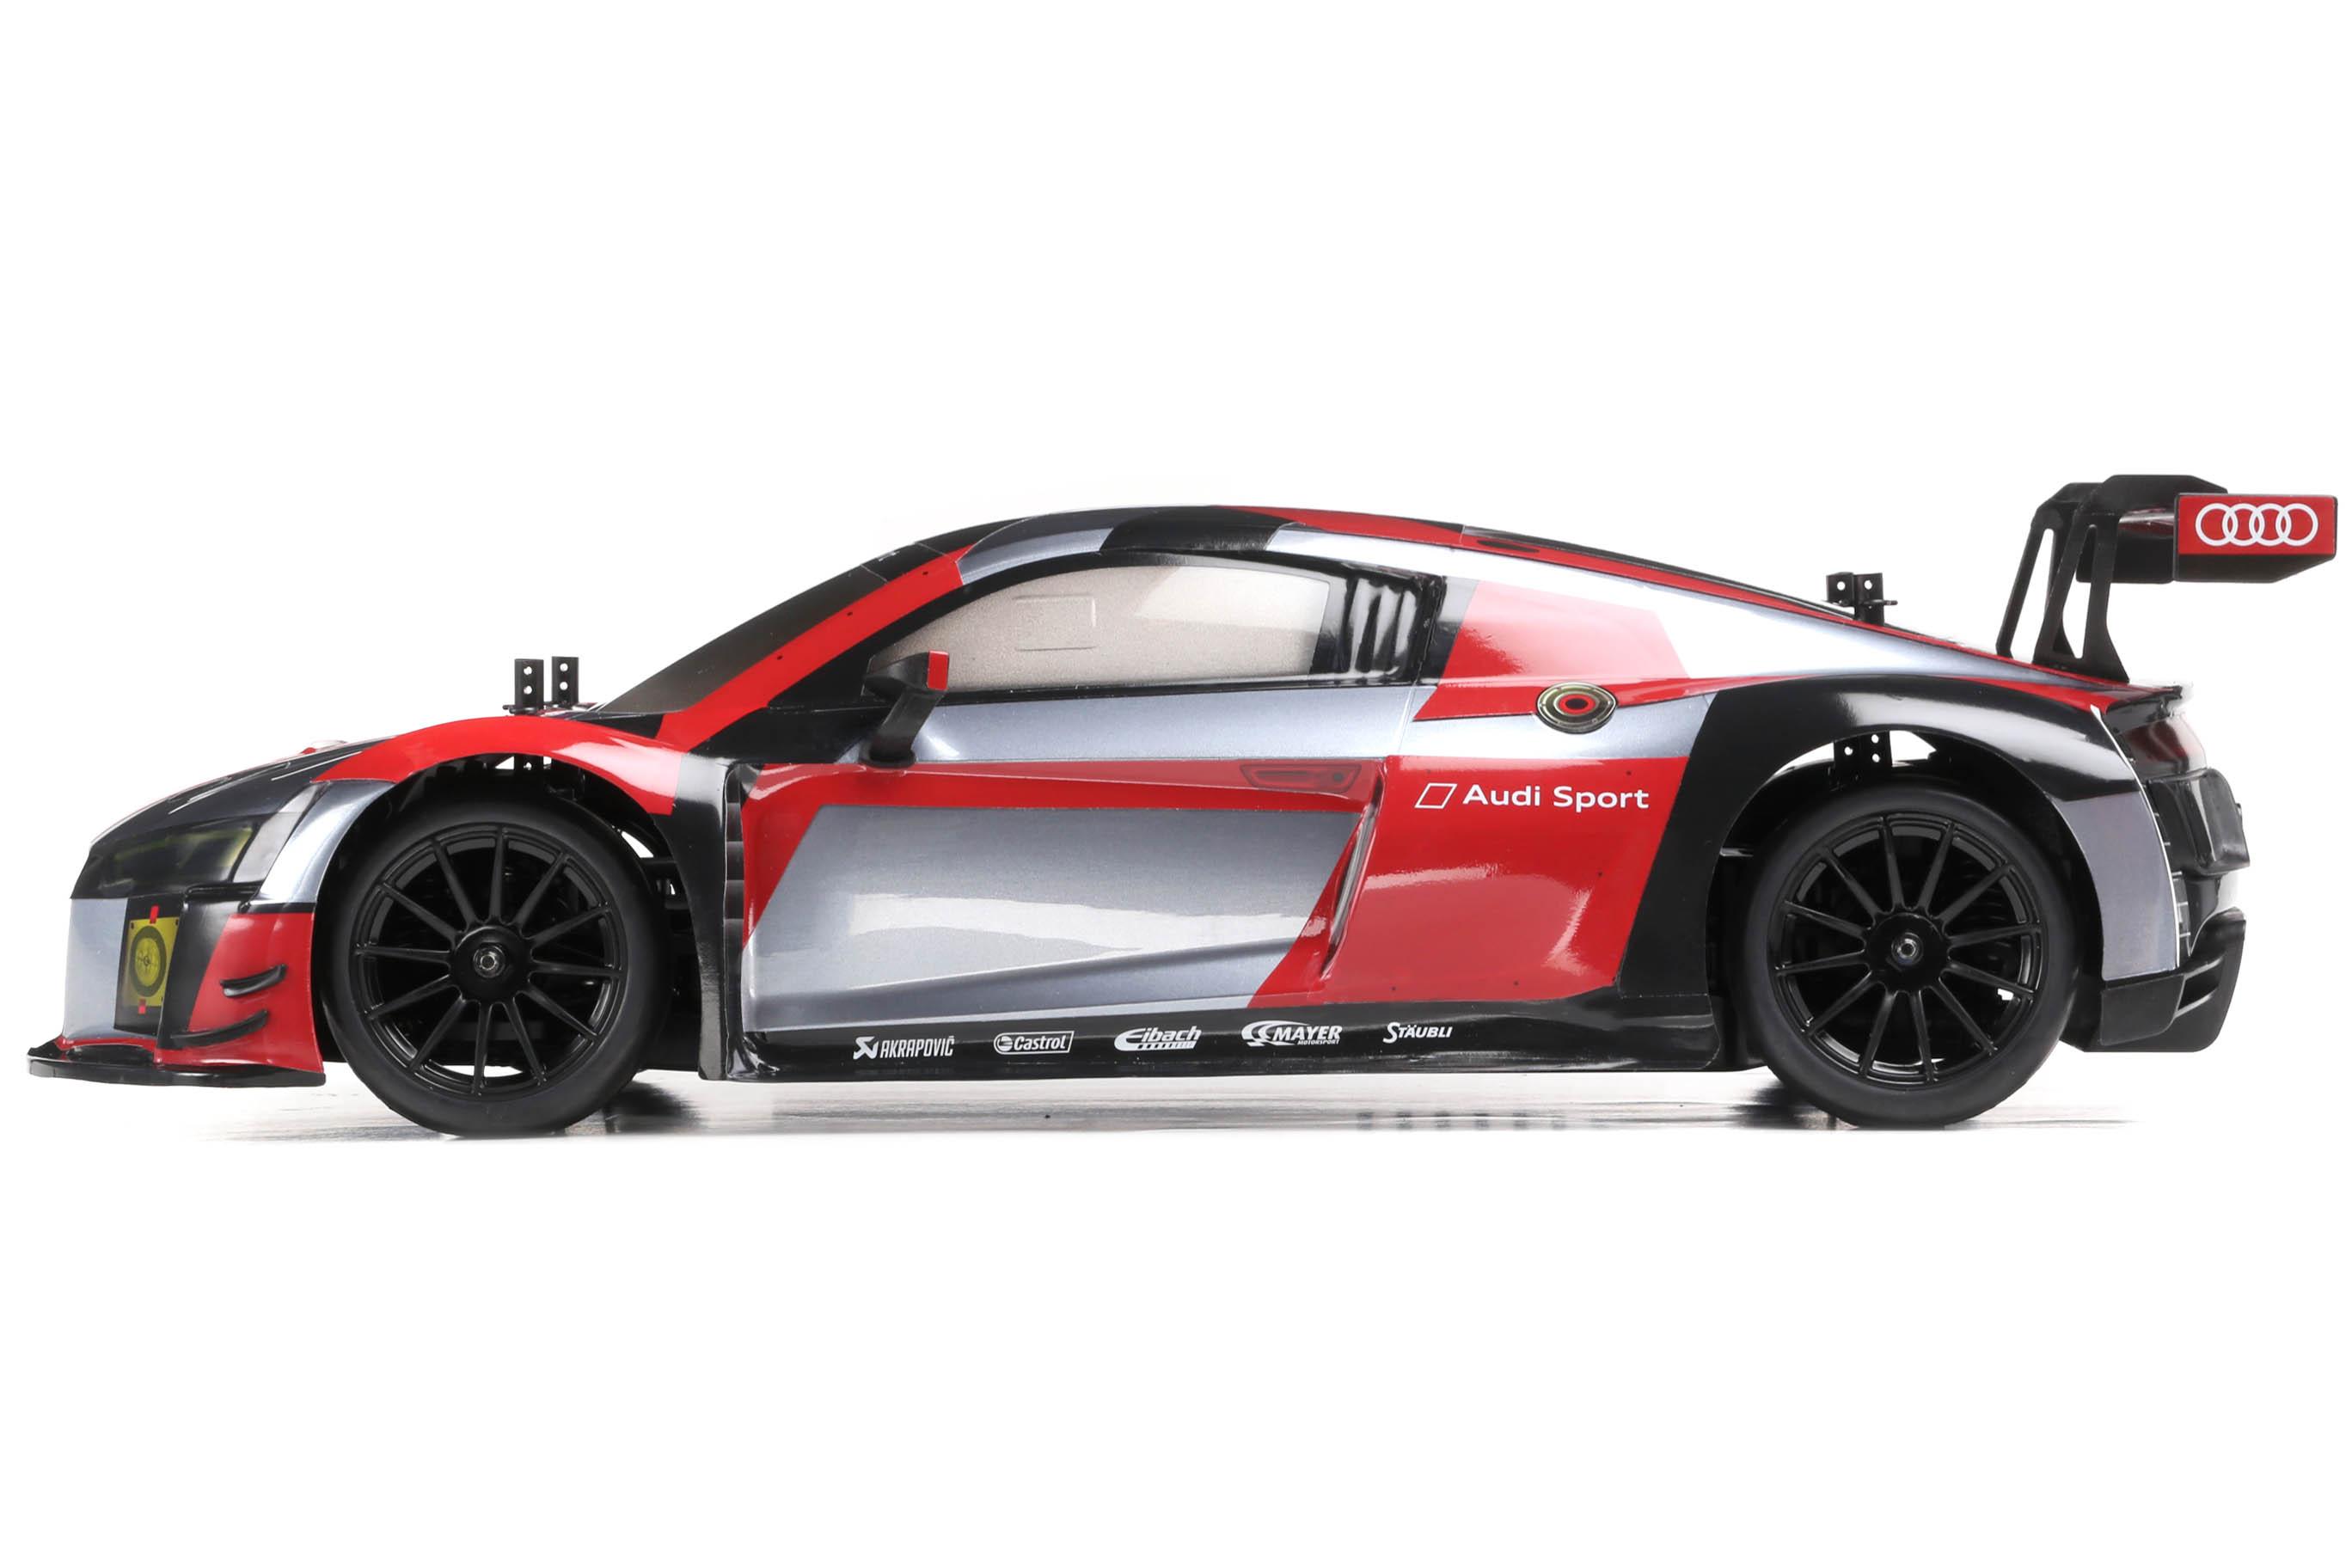 Carisma Audi R8 RTR - Side